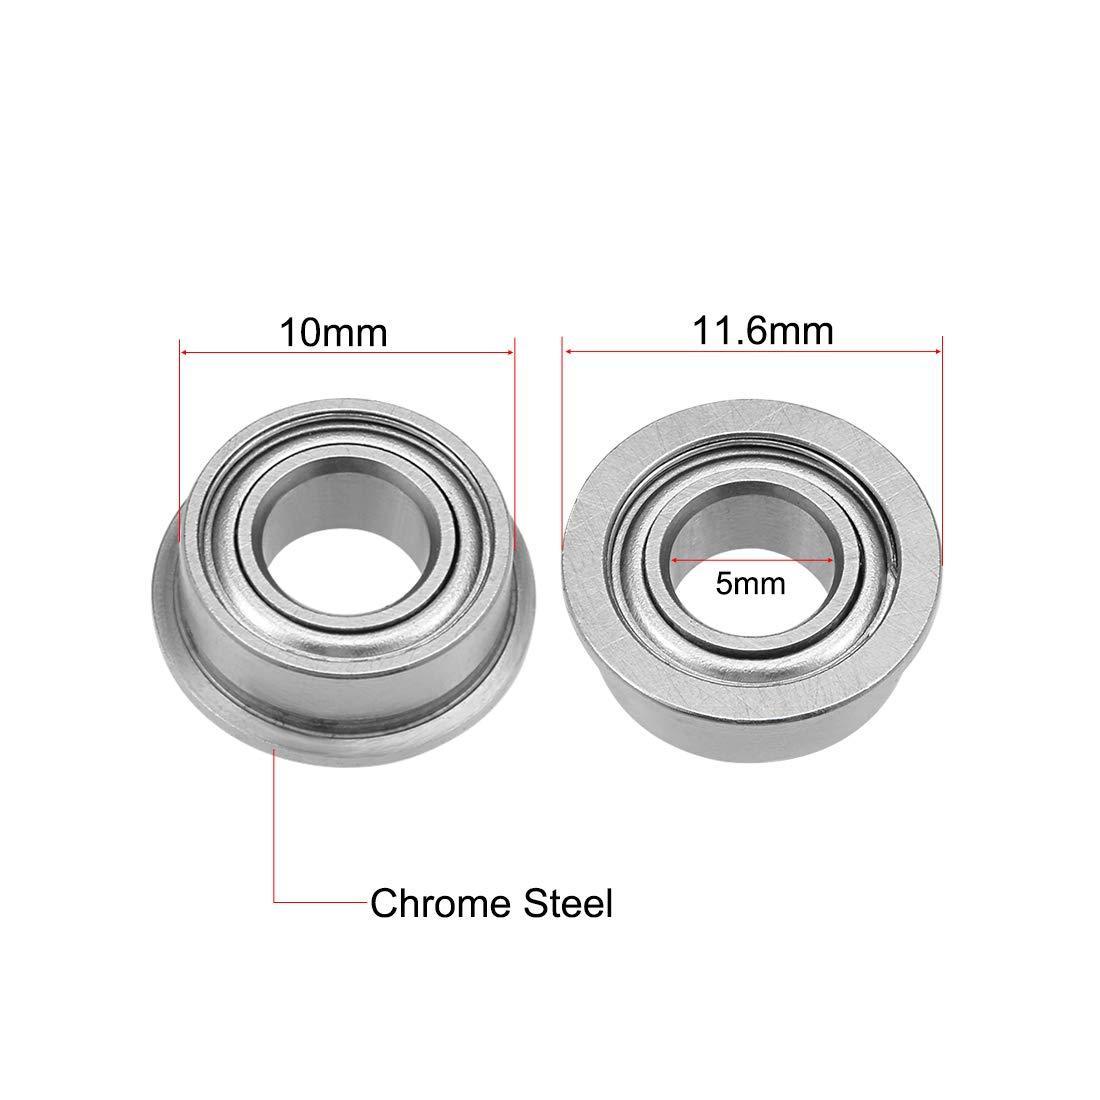 uxcell MF105ZZ Flange Ball Bearing 5x10x4mm Shielded Chrome Bearings 5pcs